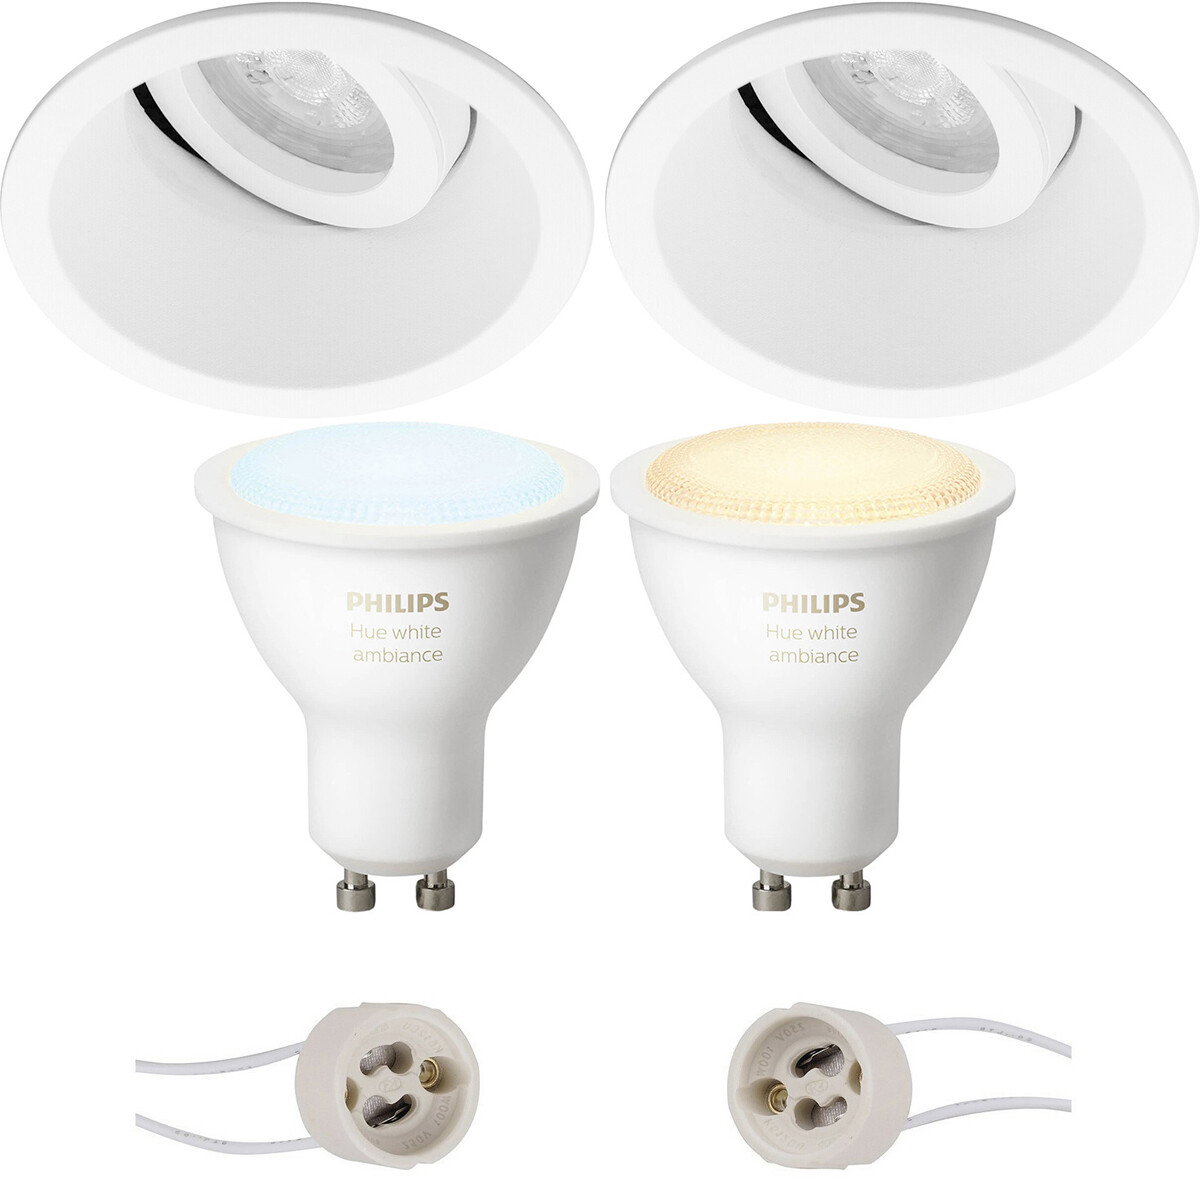 Pragmi Zano Pro - Inbouw Rond - Mat Wit - Kantelbaar - Ø93mm - Philips Hue - LED Spot Set GU10 - Whi